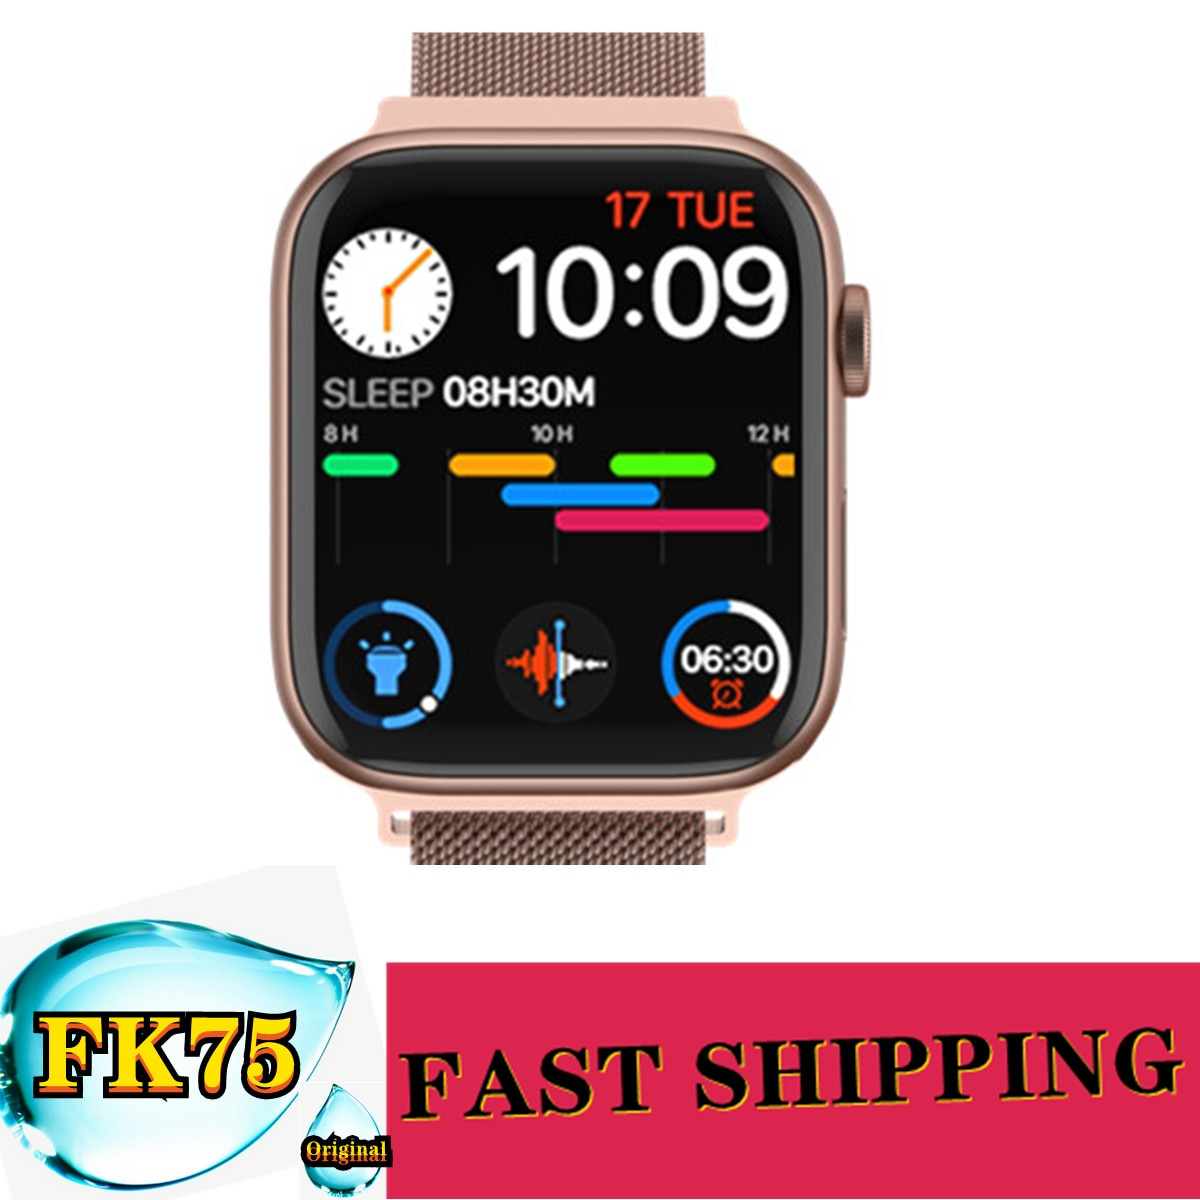 "Review 5pcs New IWO FK75 Smart Watch Series 6 1.75""HD Infinite Screen Bluetooth Call Custom Background Heart Rate Monitor Smartwatch"